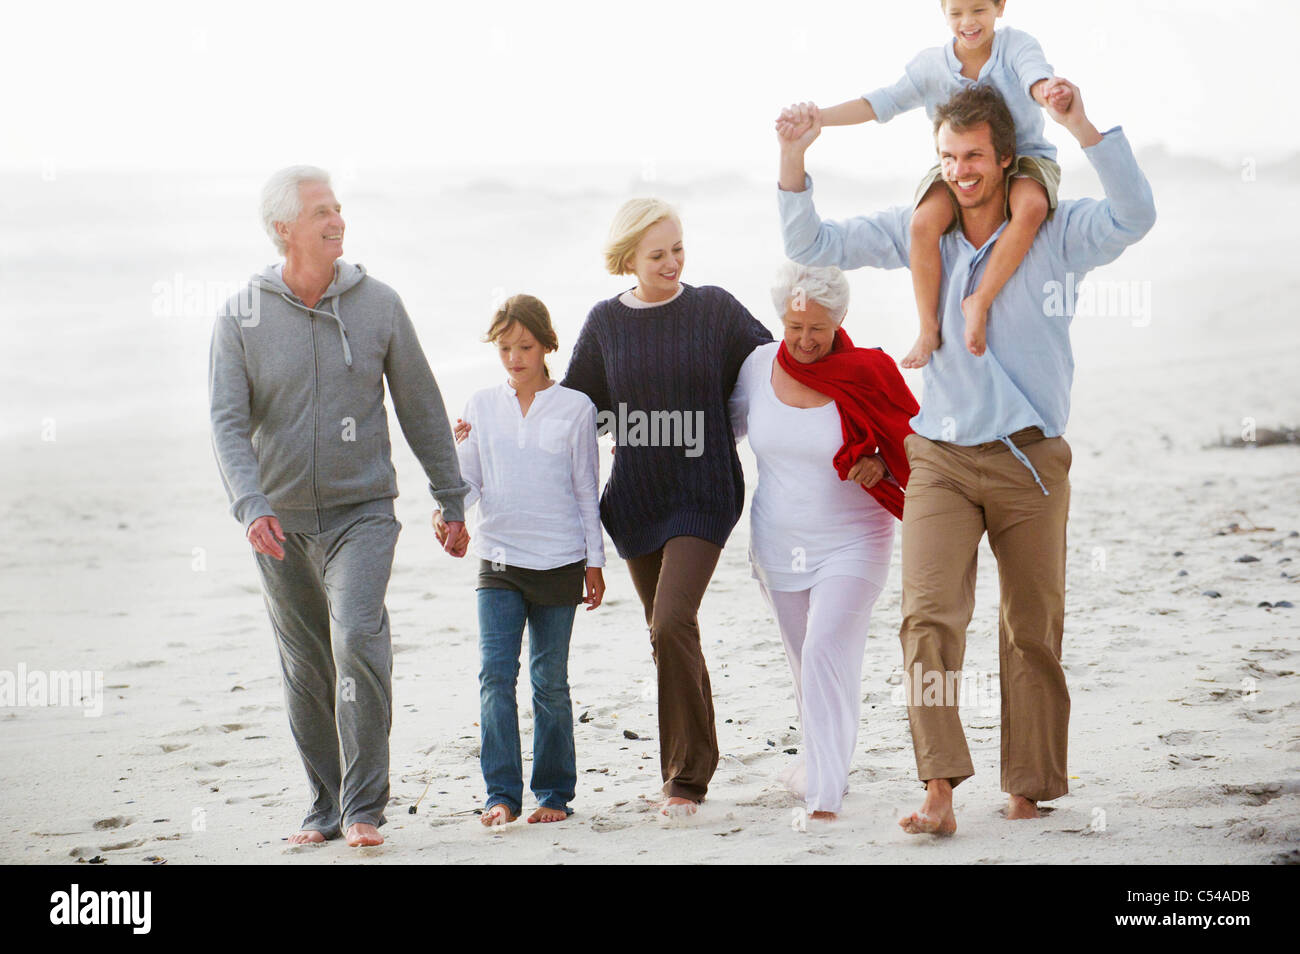 Mehr-Generationen-Familie am Strand Stockbild